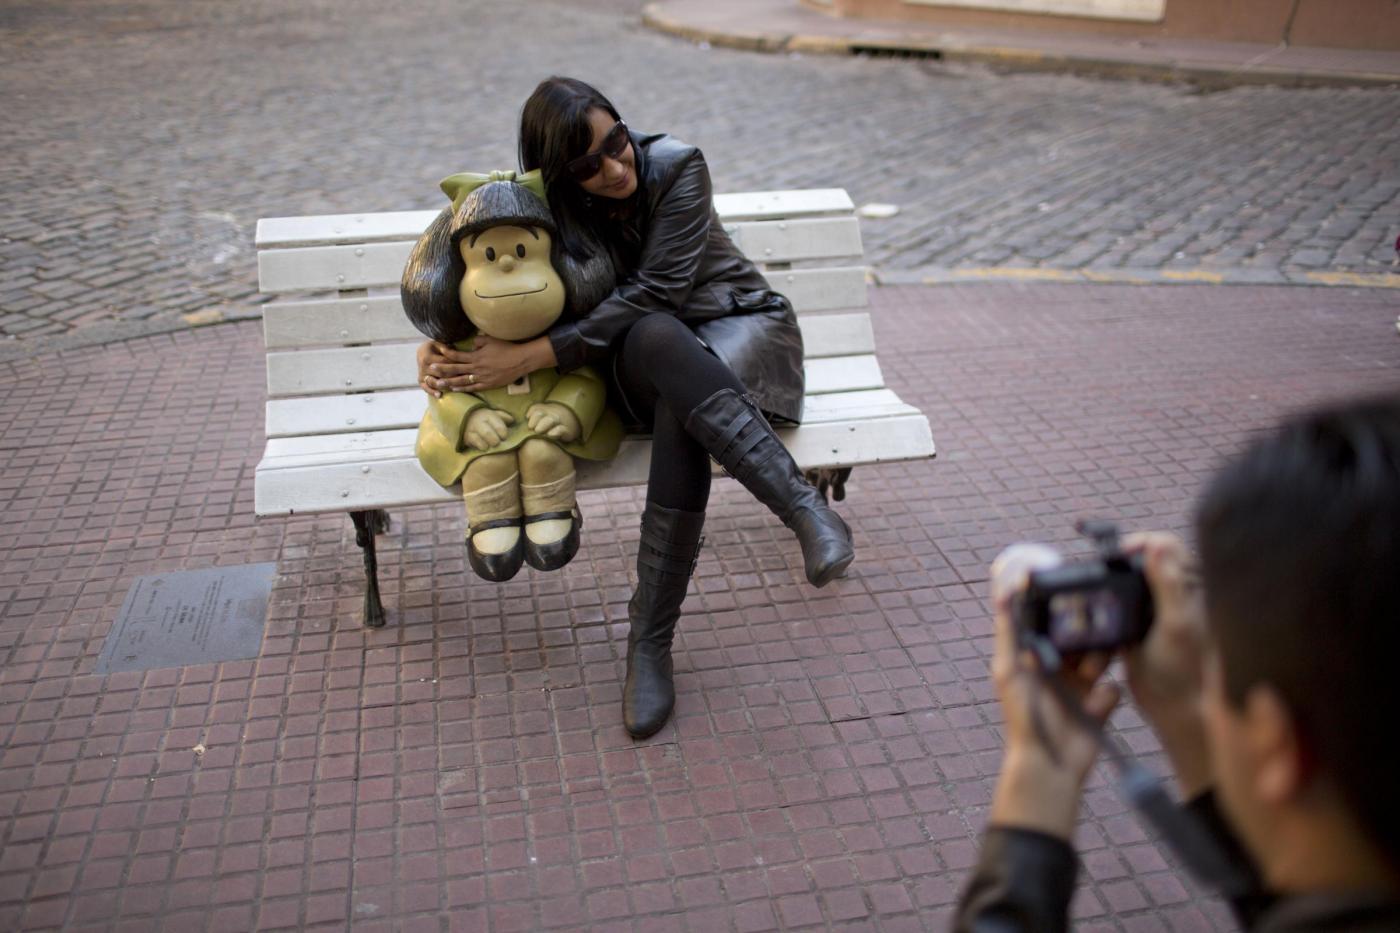 Mafalda compie 50 anni: mostra a lei dedicata a Buenos Aires06